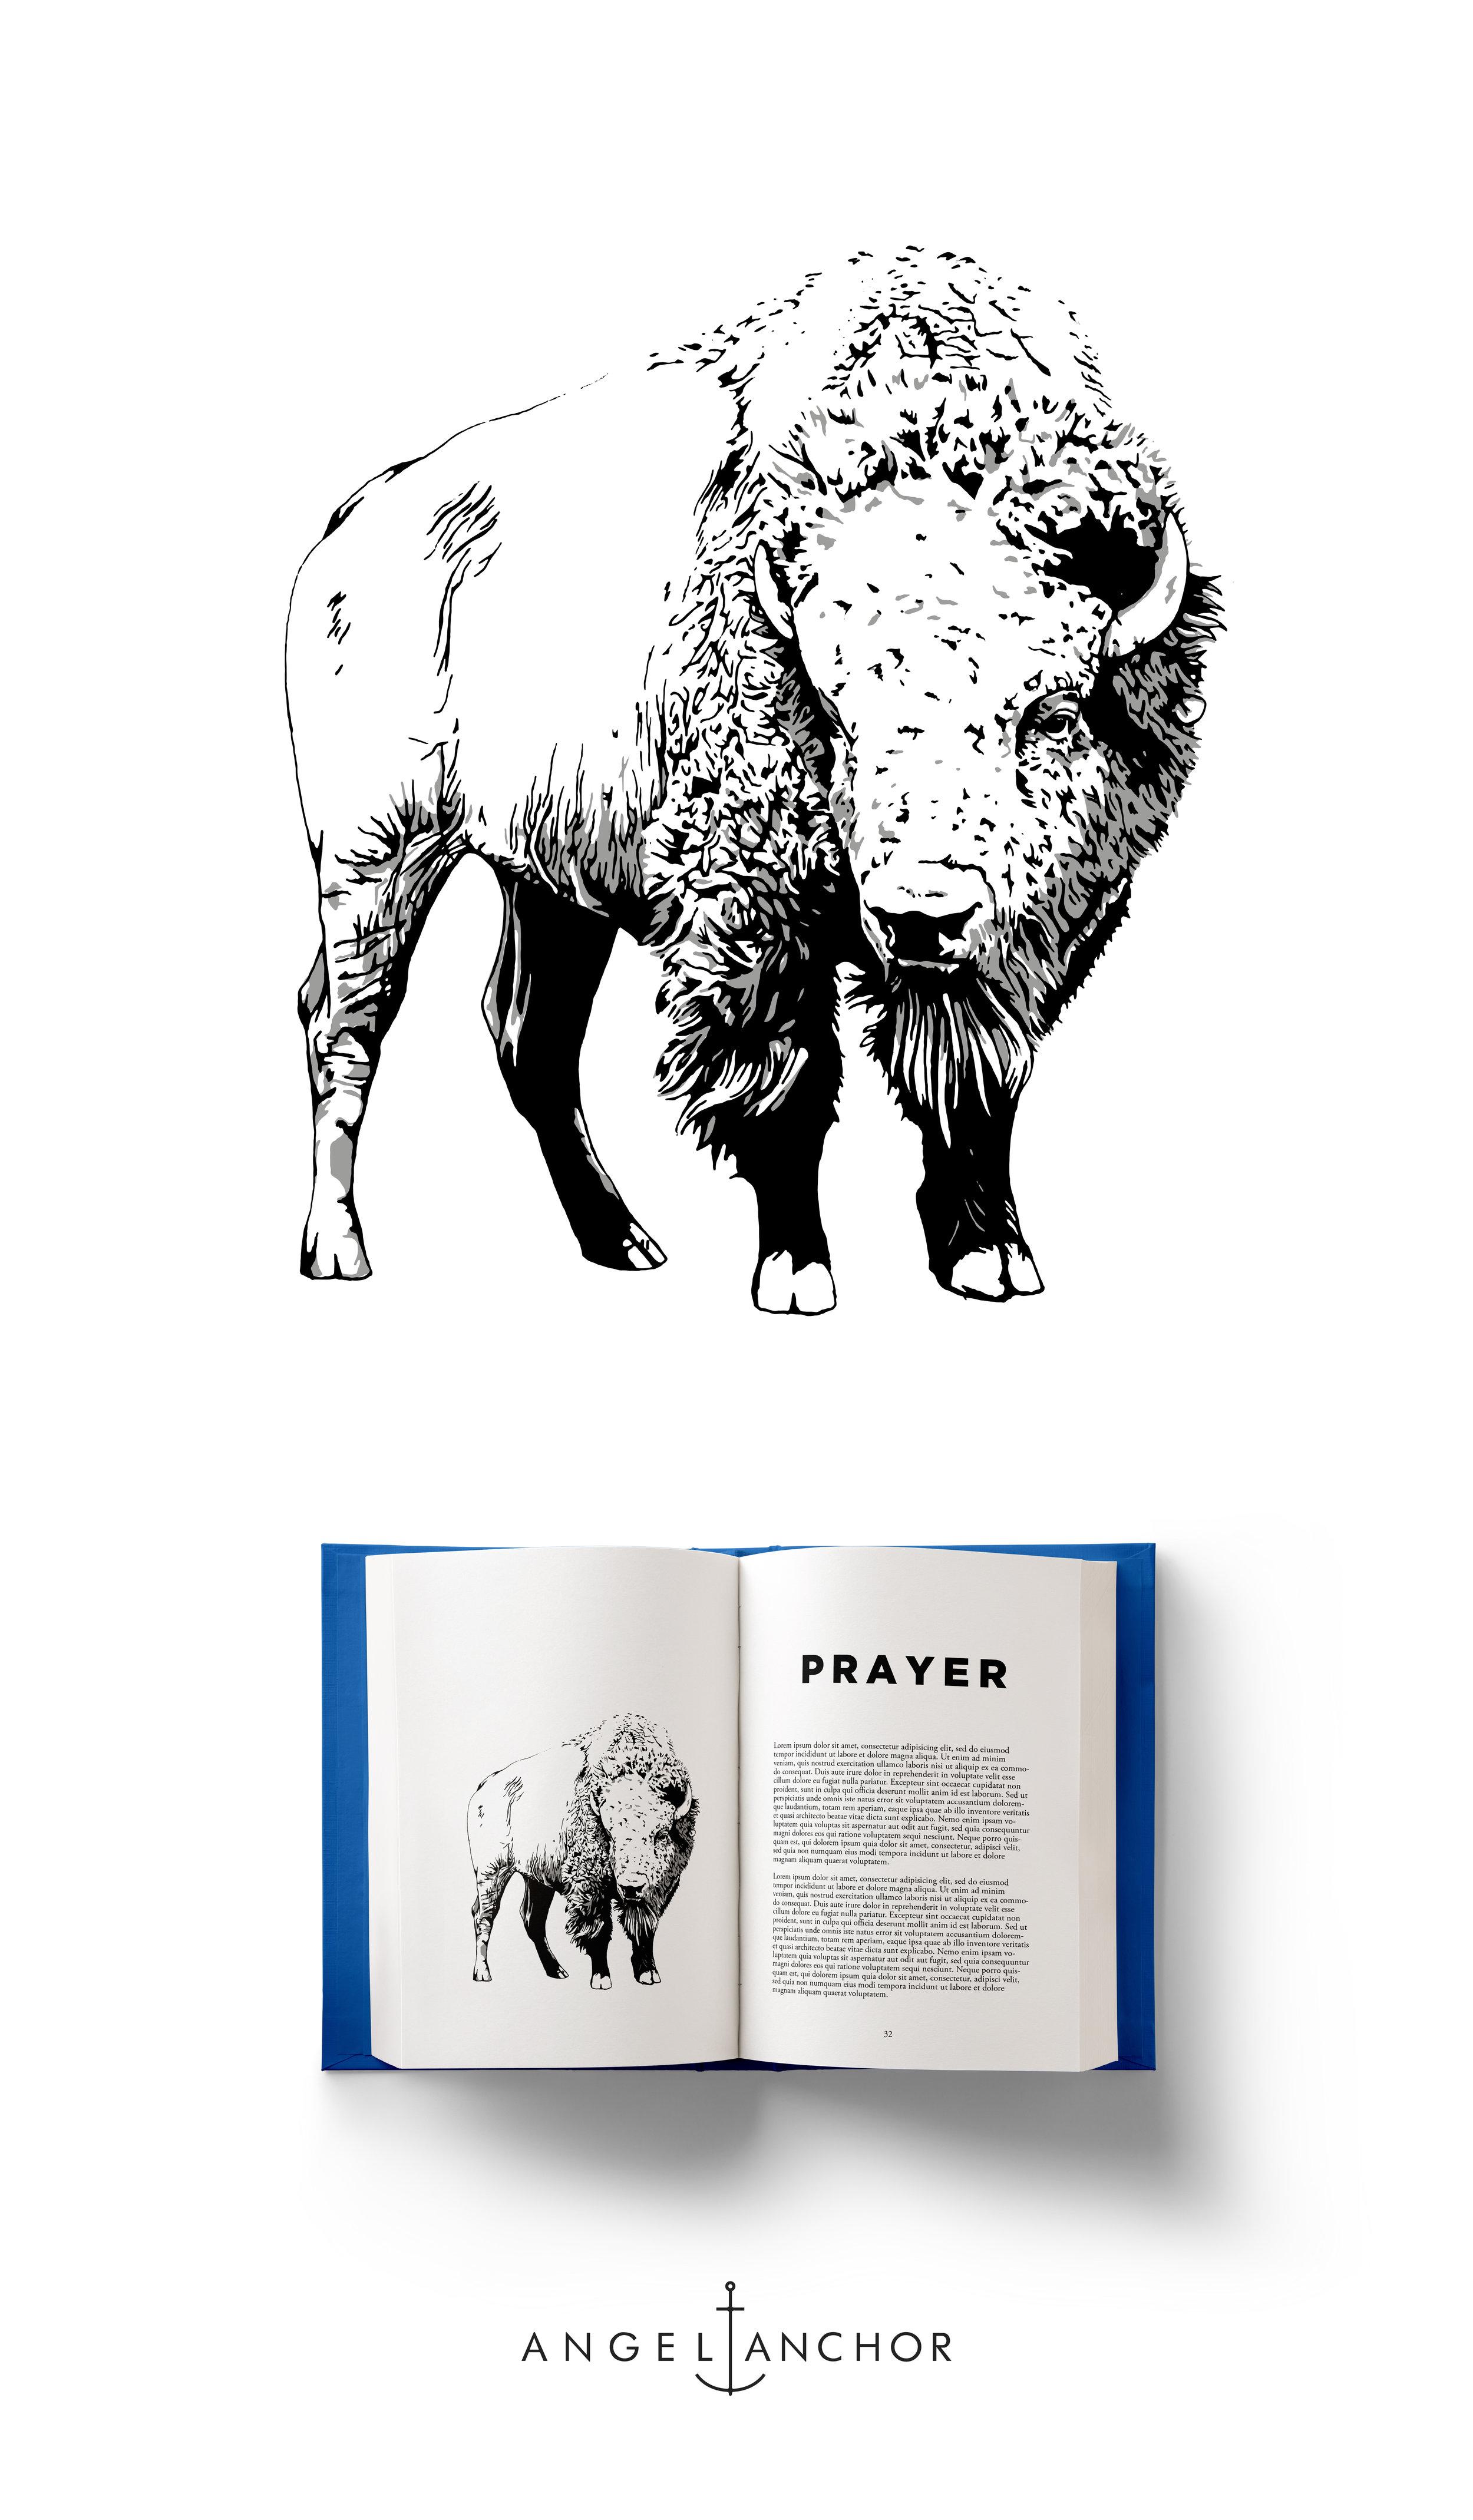 #2 - PRAYER